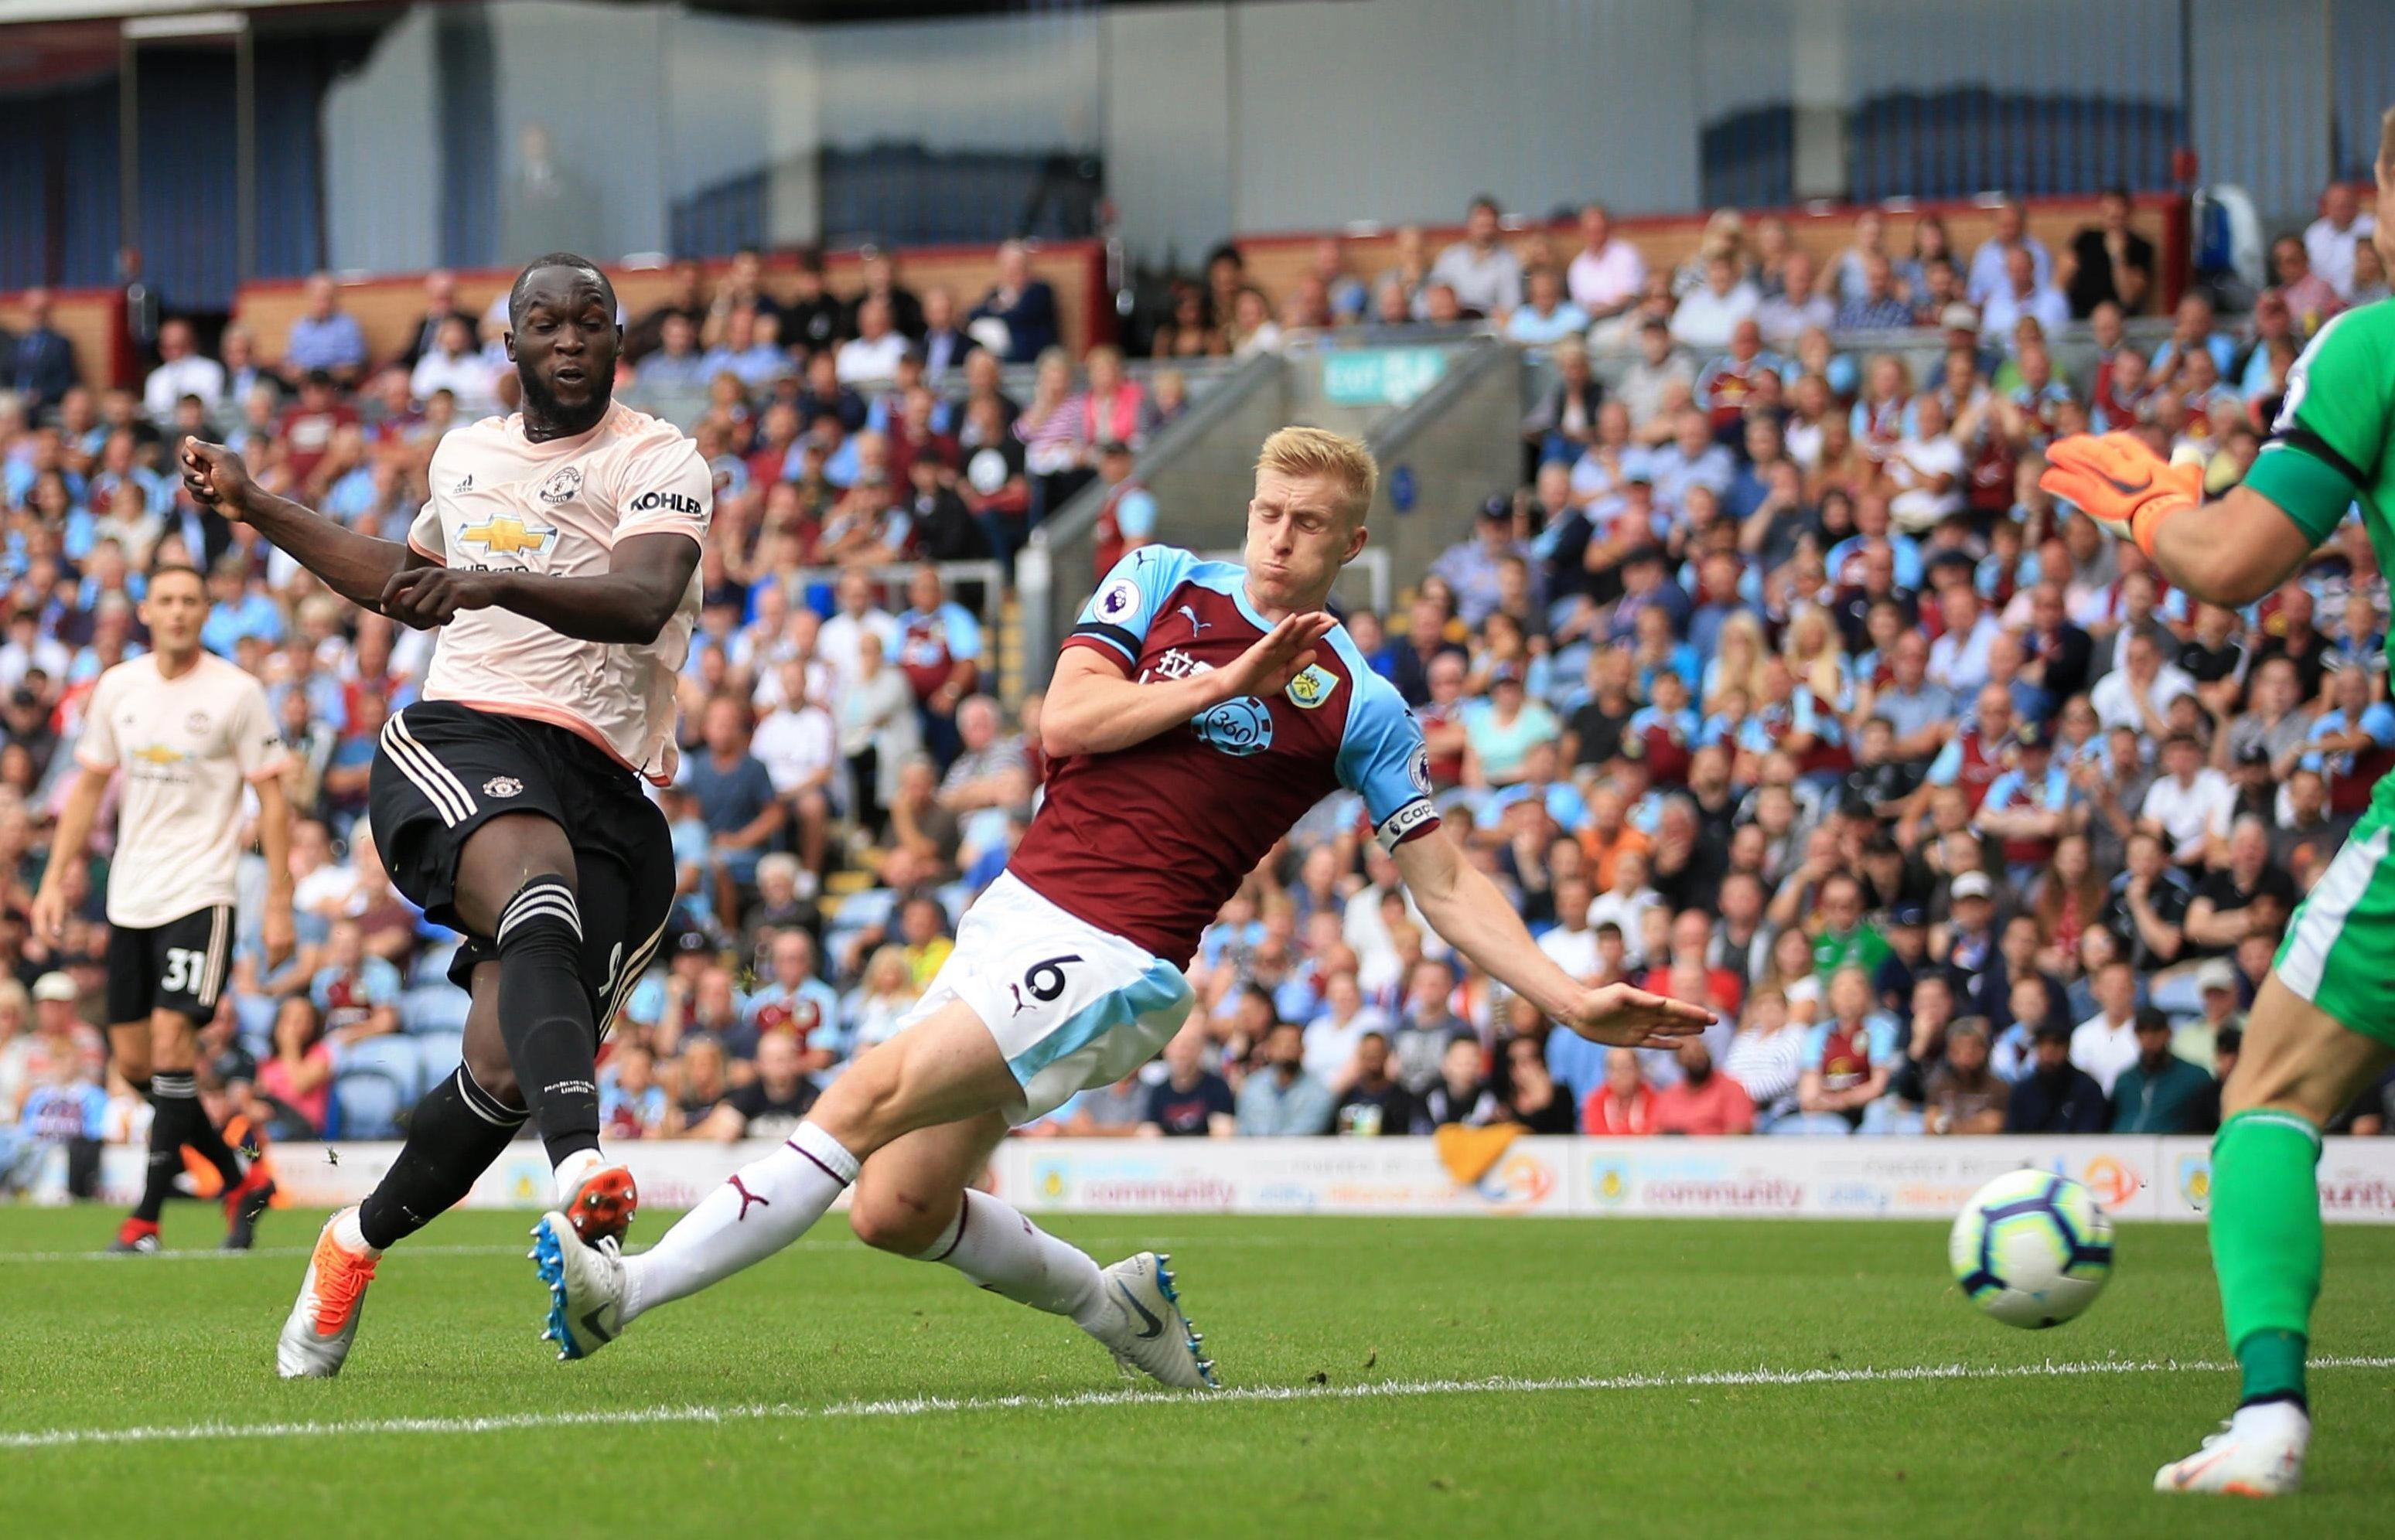 Belgian striker Lukaku struck twice in the first half to secure the points